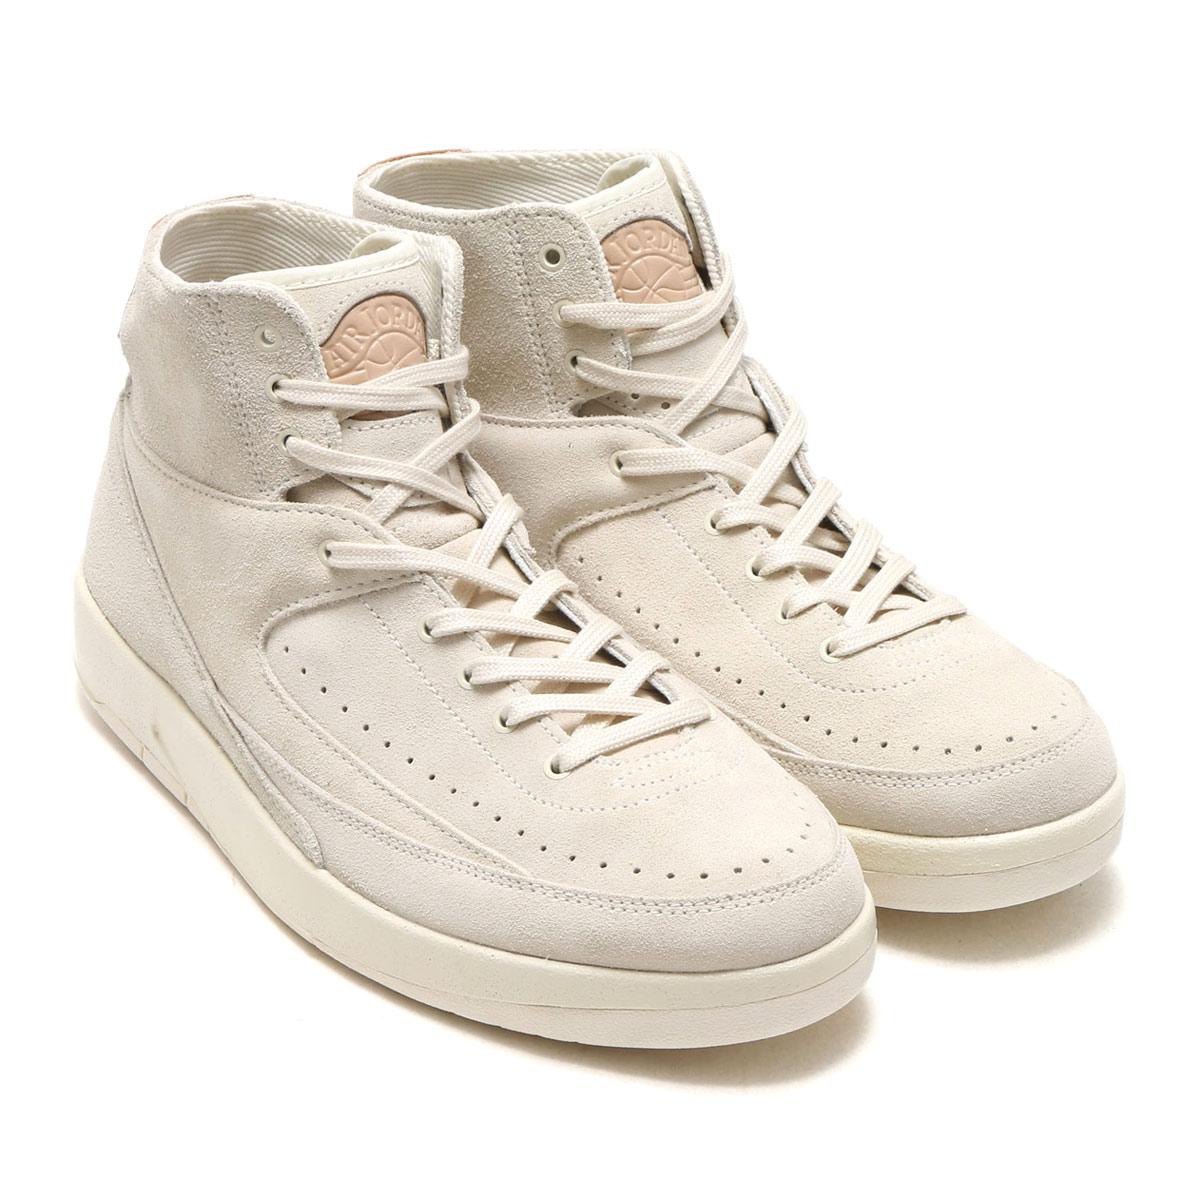 824ef17bcb4dc3 NIKE AIR JORDAN 2 RETRO DECON (Nike Air Jordan 2 nostalgic DECON)  (SAIL SAIL-BIO BEIGE) 17FA-S